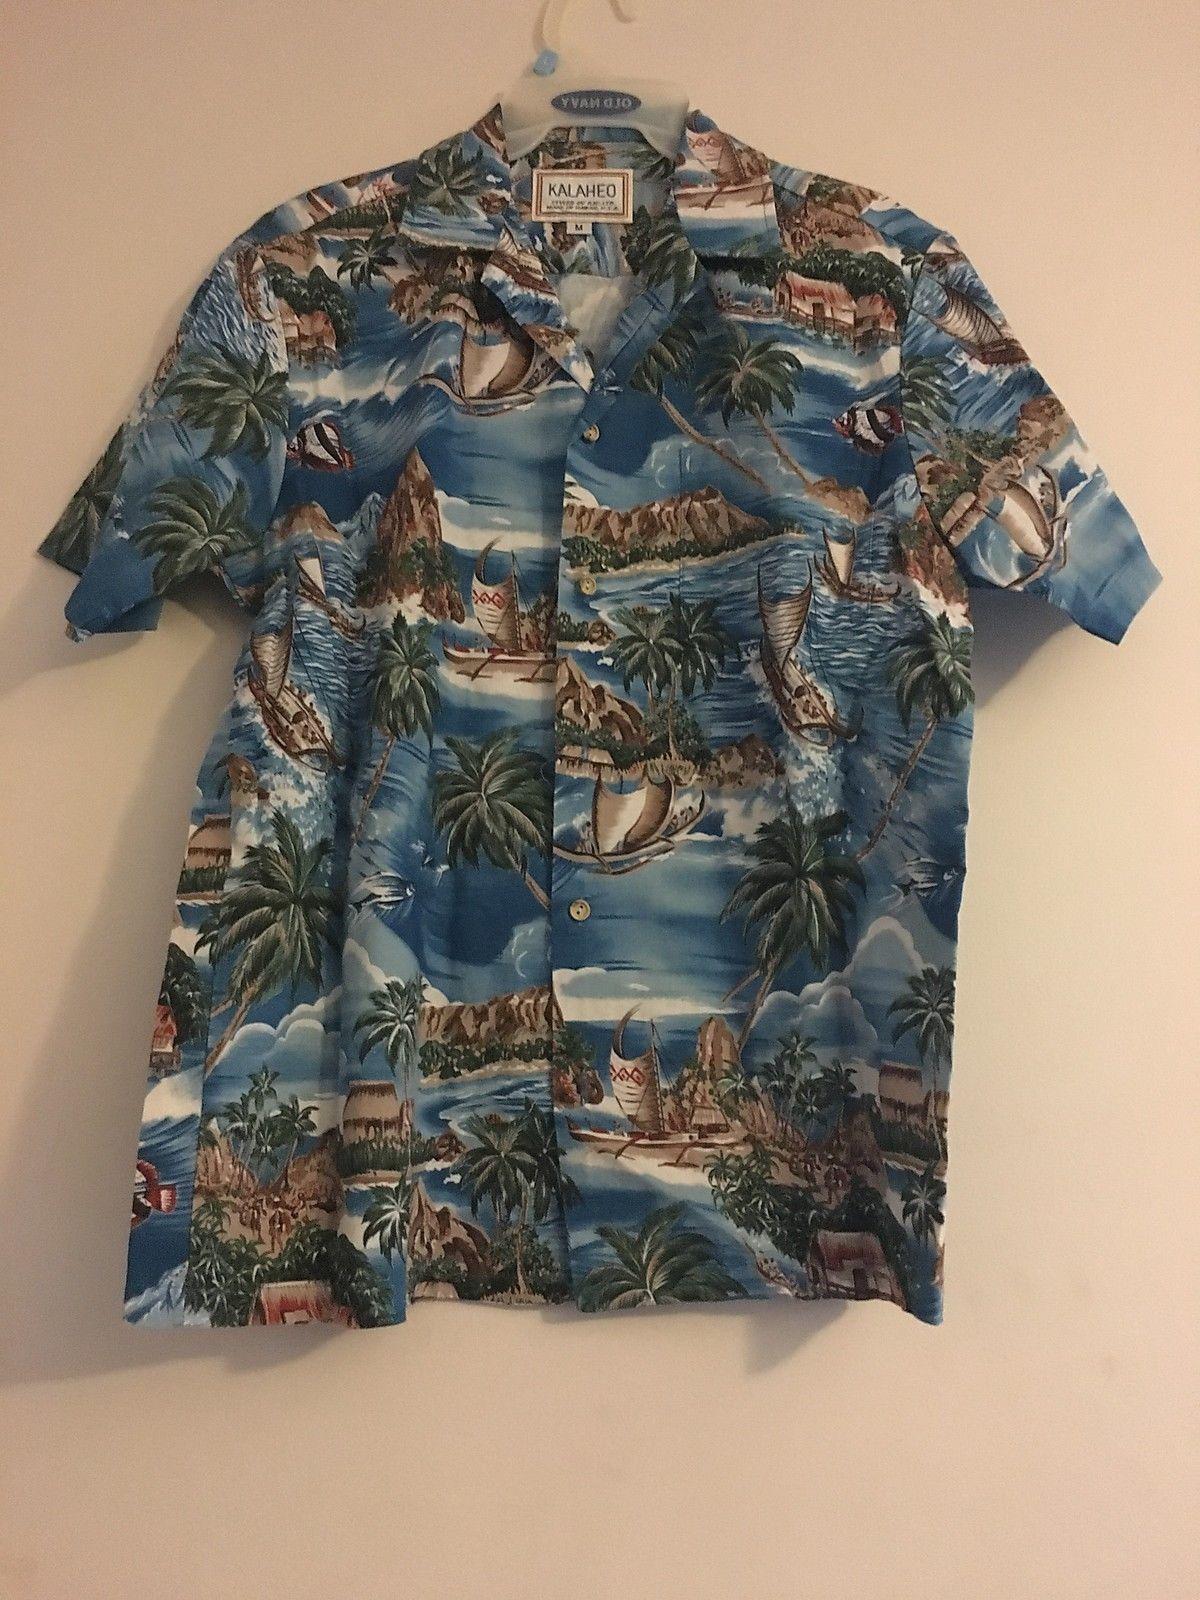 0712bb91d Vintage Kalaheo Rjc Hawaiian Aloha Shirt and 37 similar items. S l1600